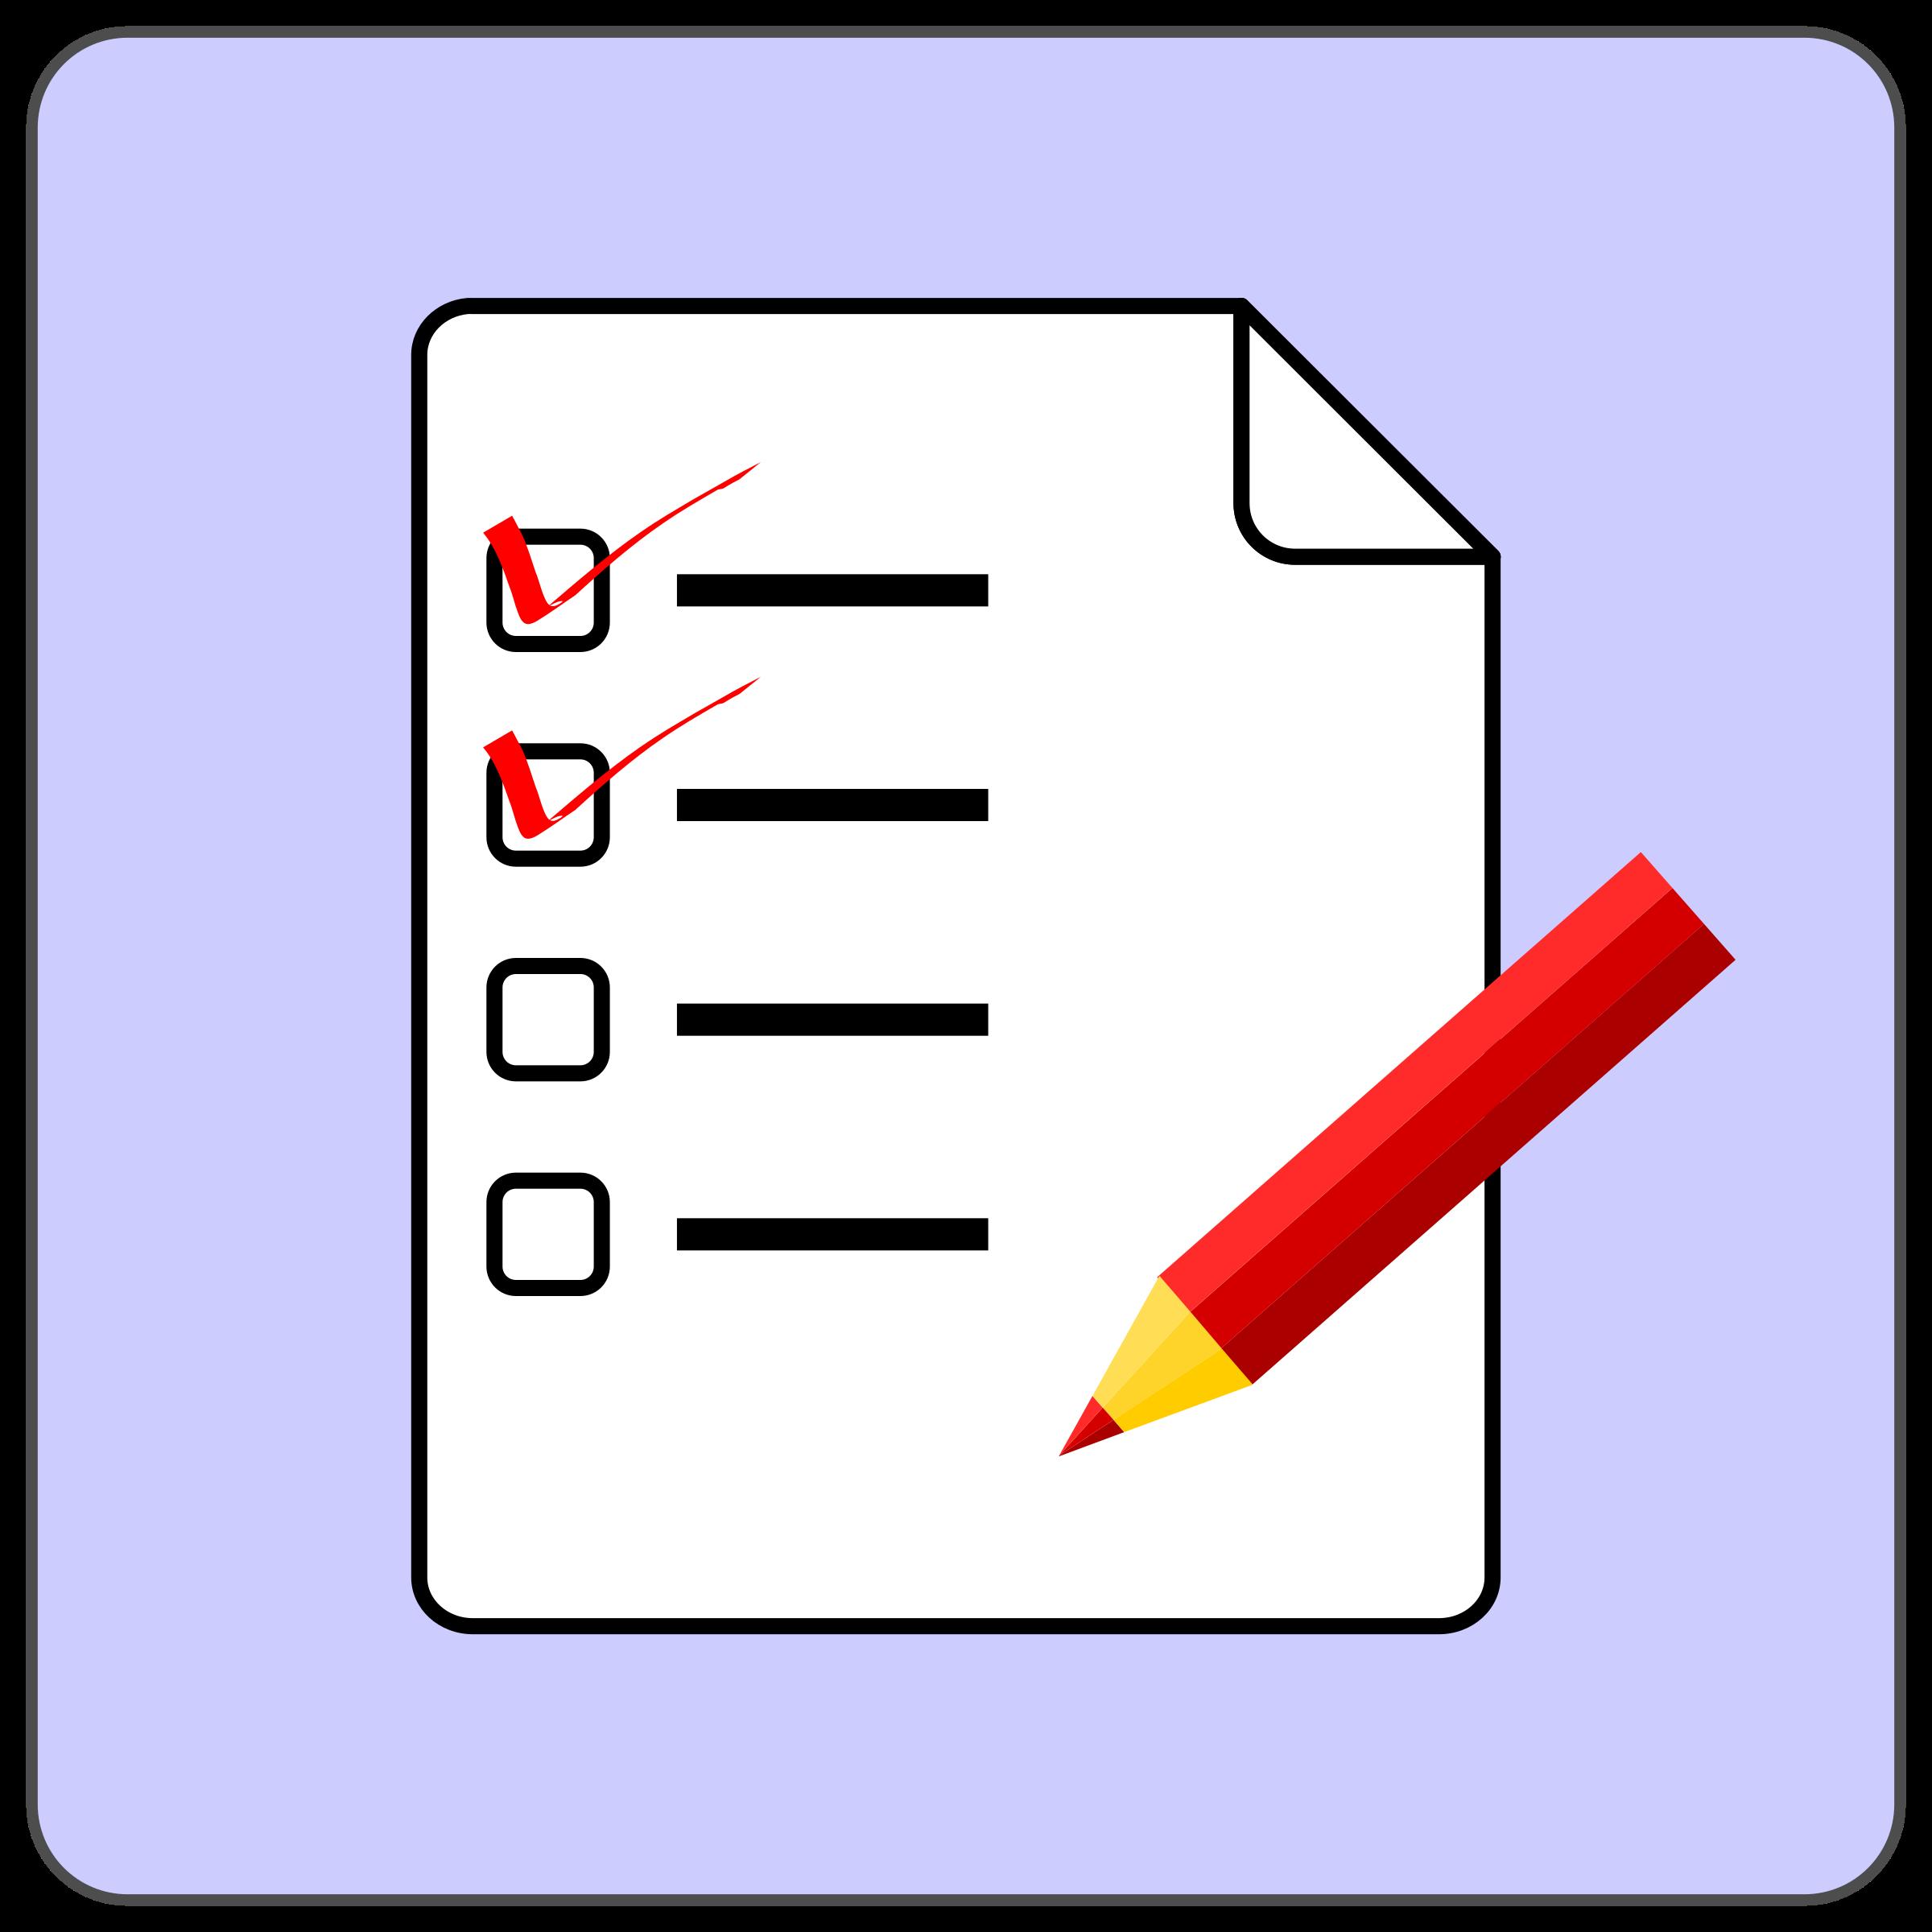 Big image png. Checklist clipart icon